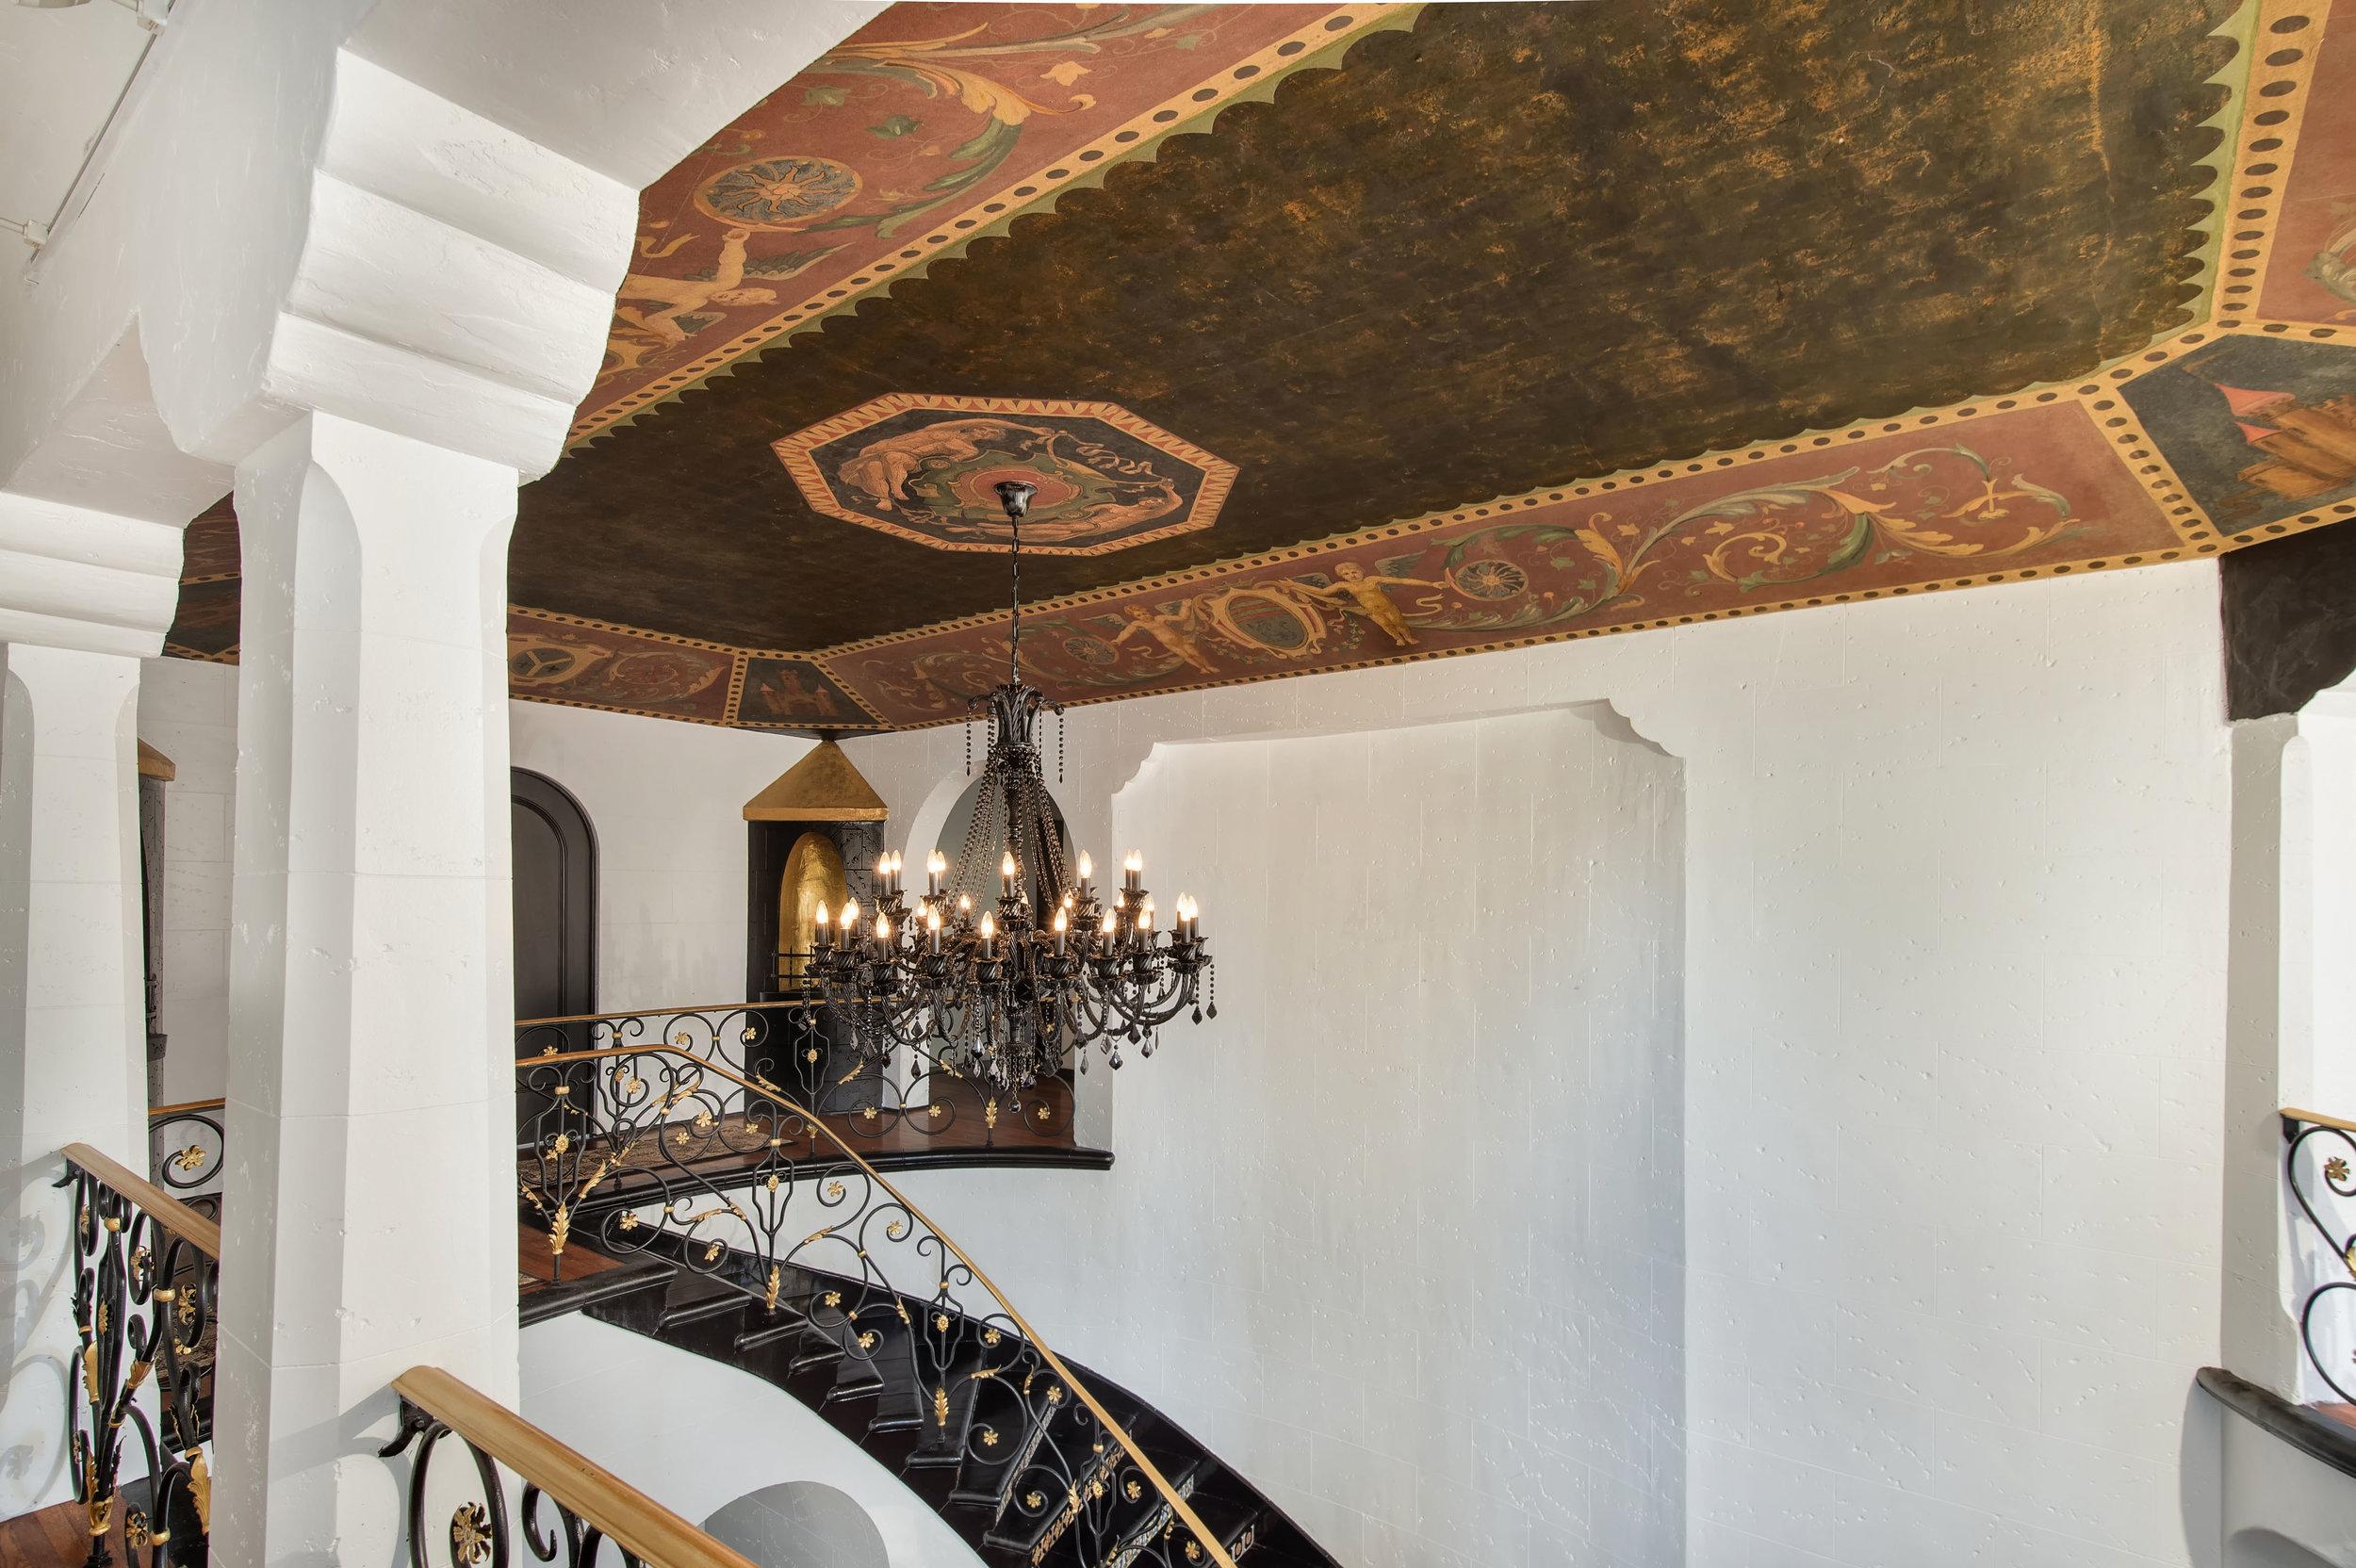 012 Ceiling 006 Pool 4915 Los Feliz For Sale Los Angeles Lease The Malibu Life Team Luxury Real Estate.jpg